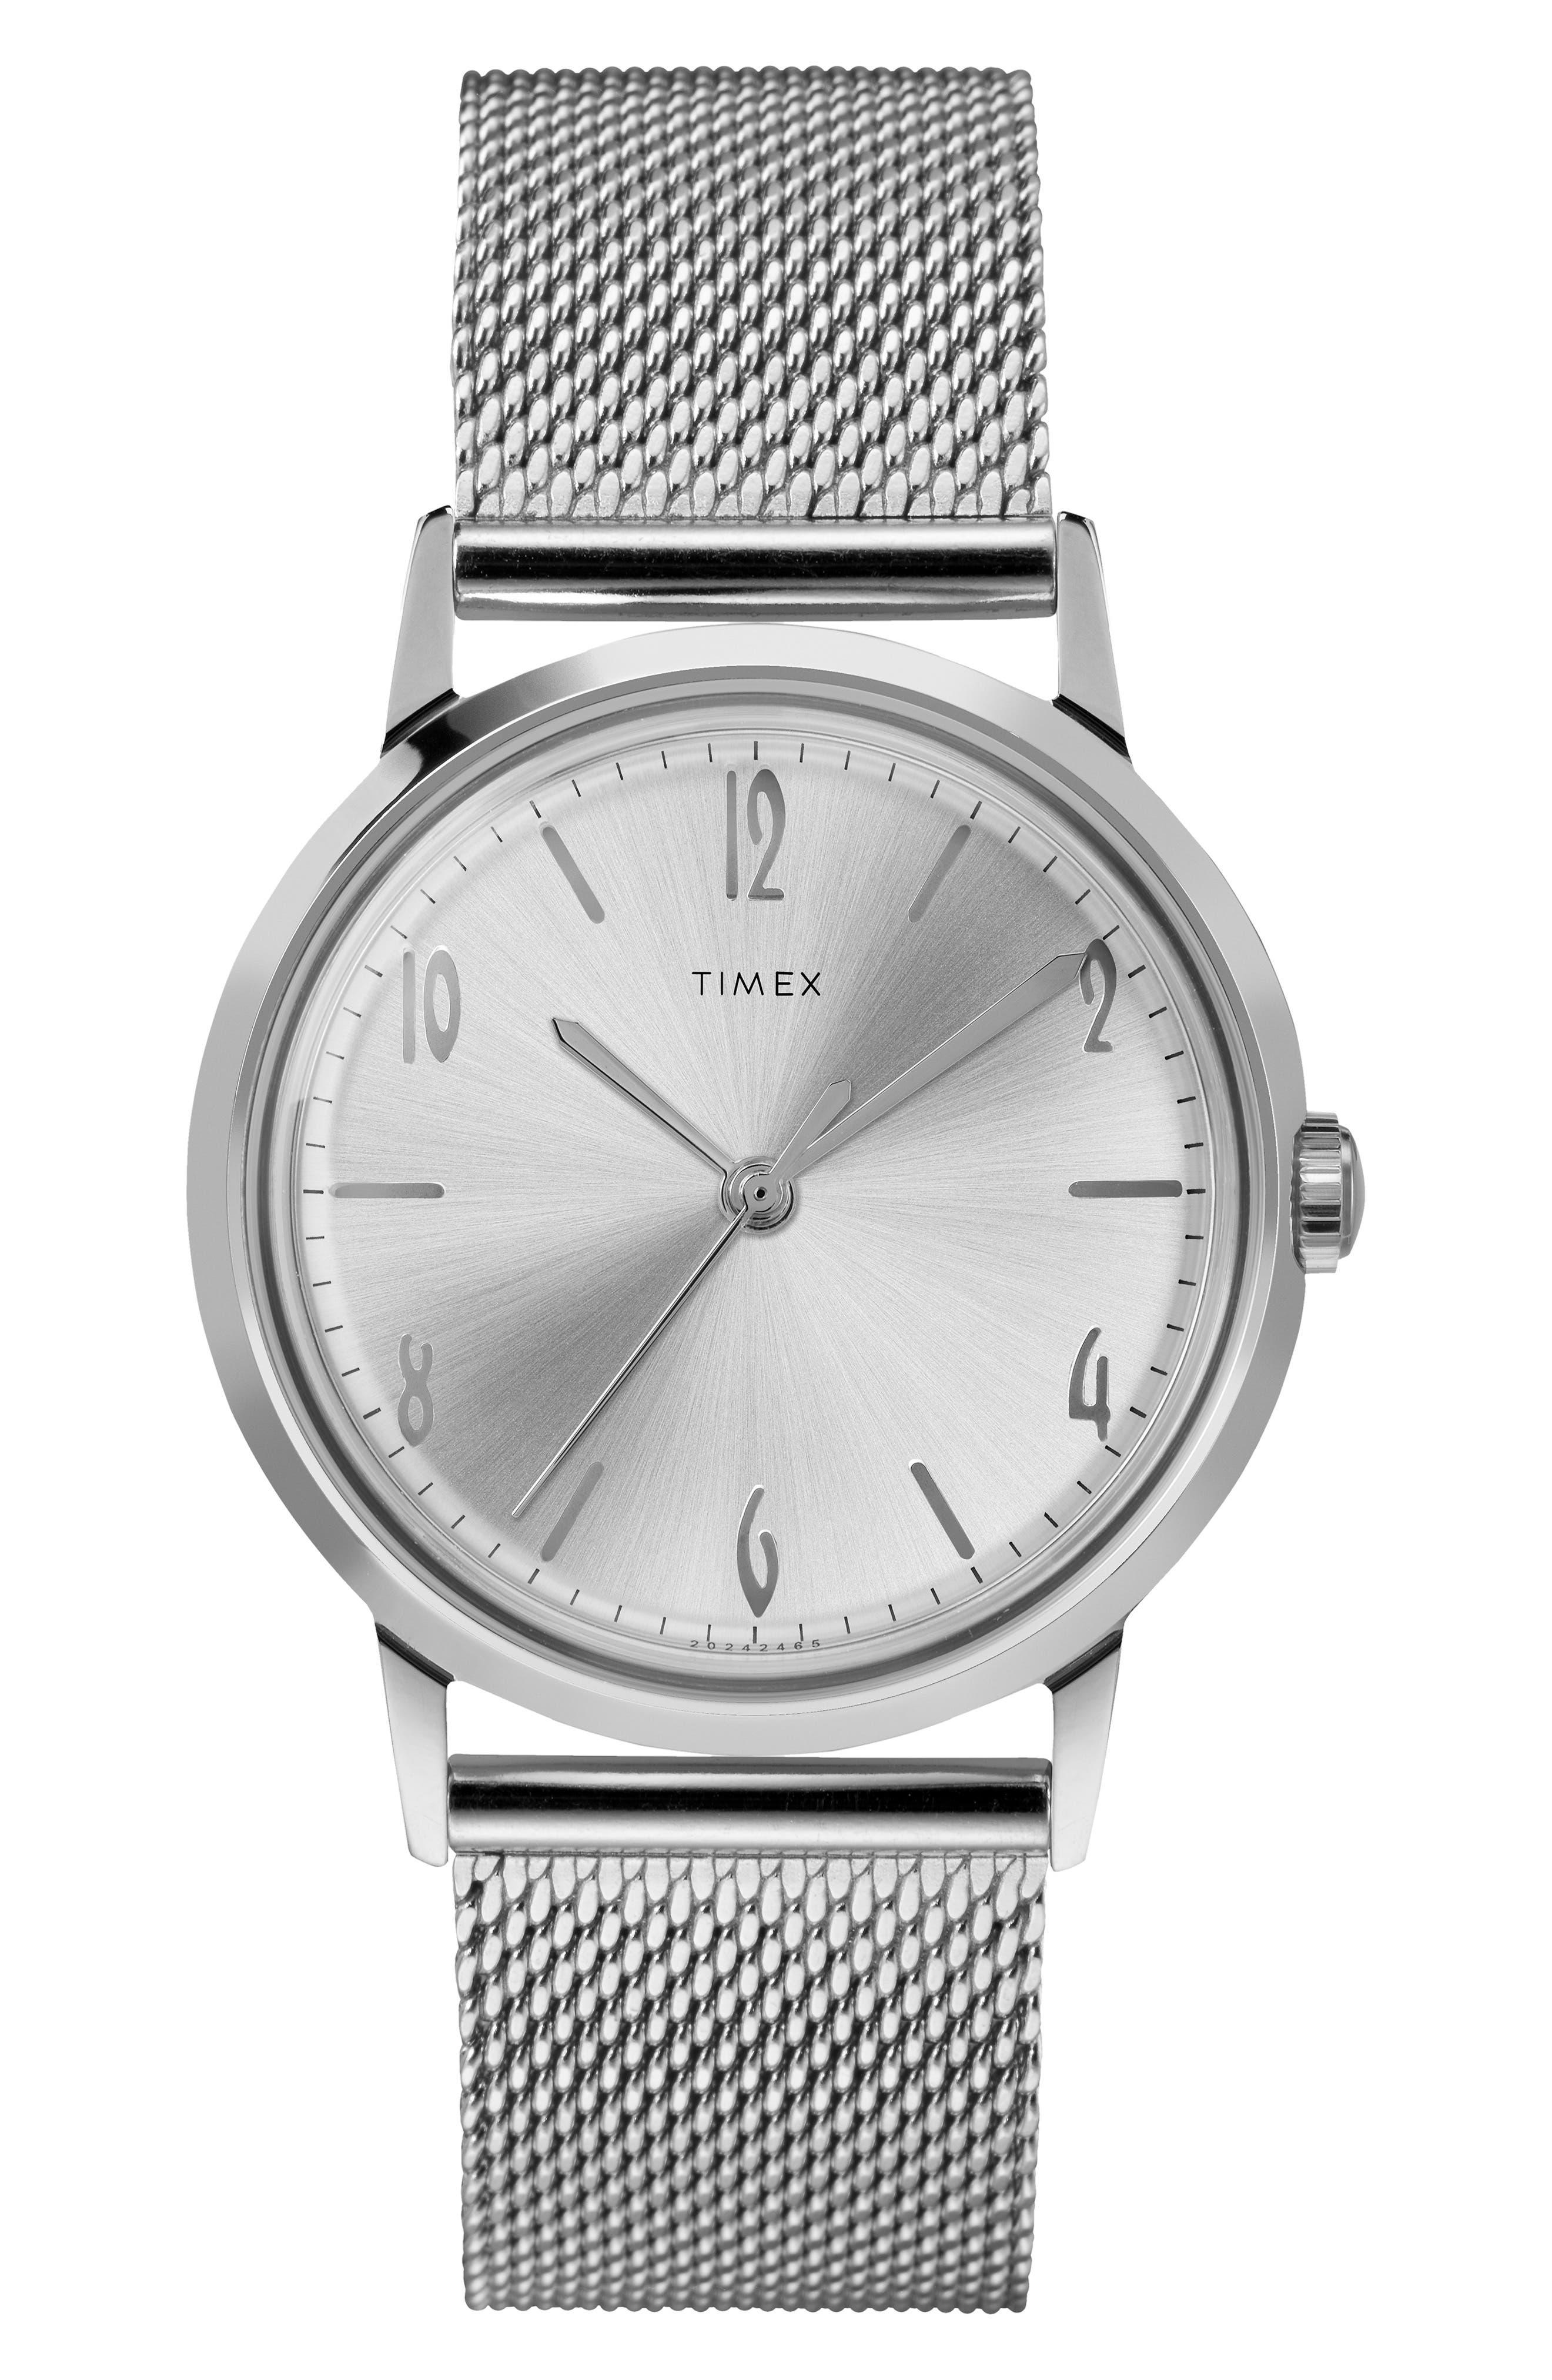 Timex Marlin Mesh Strap Mechanical Watch,